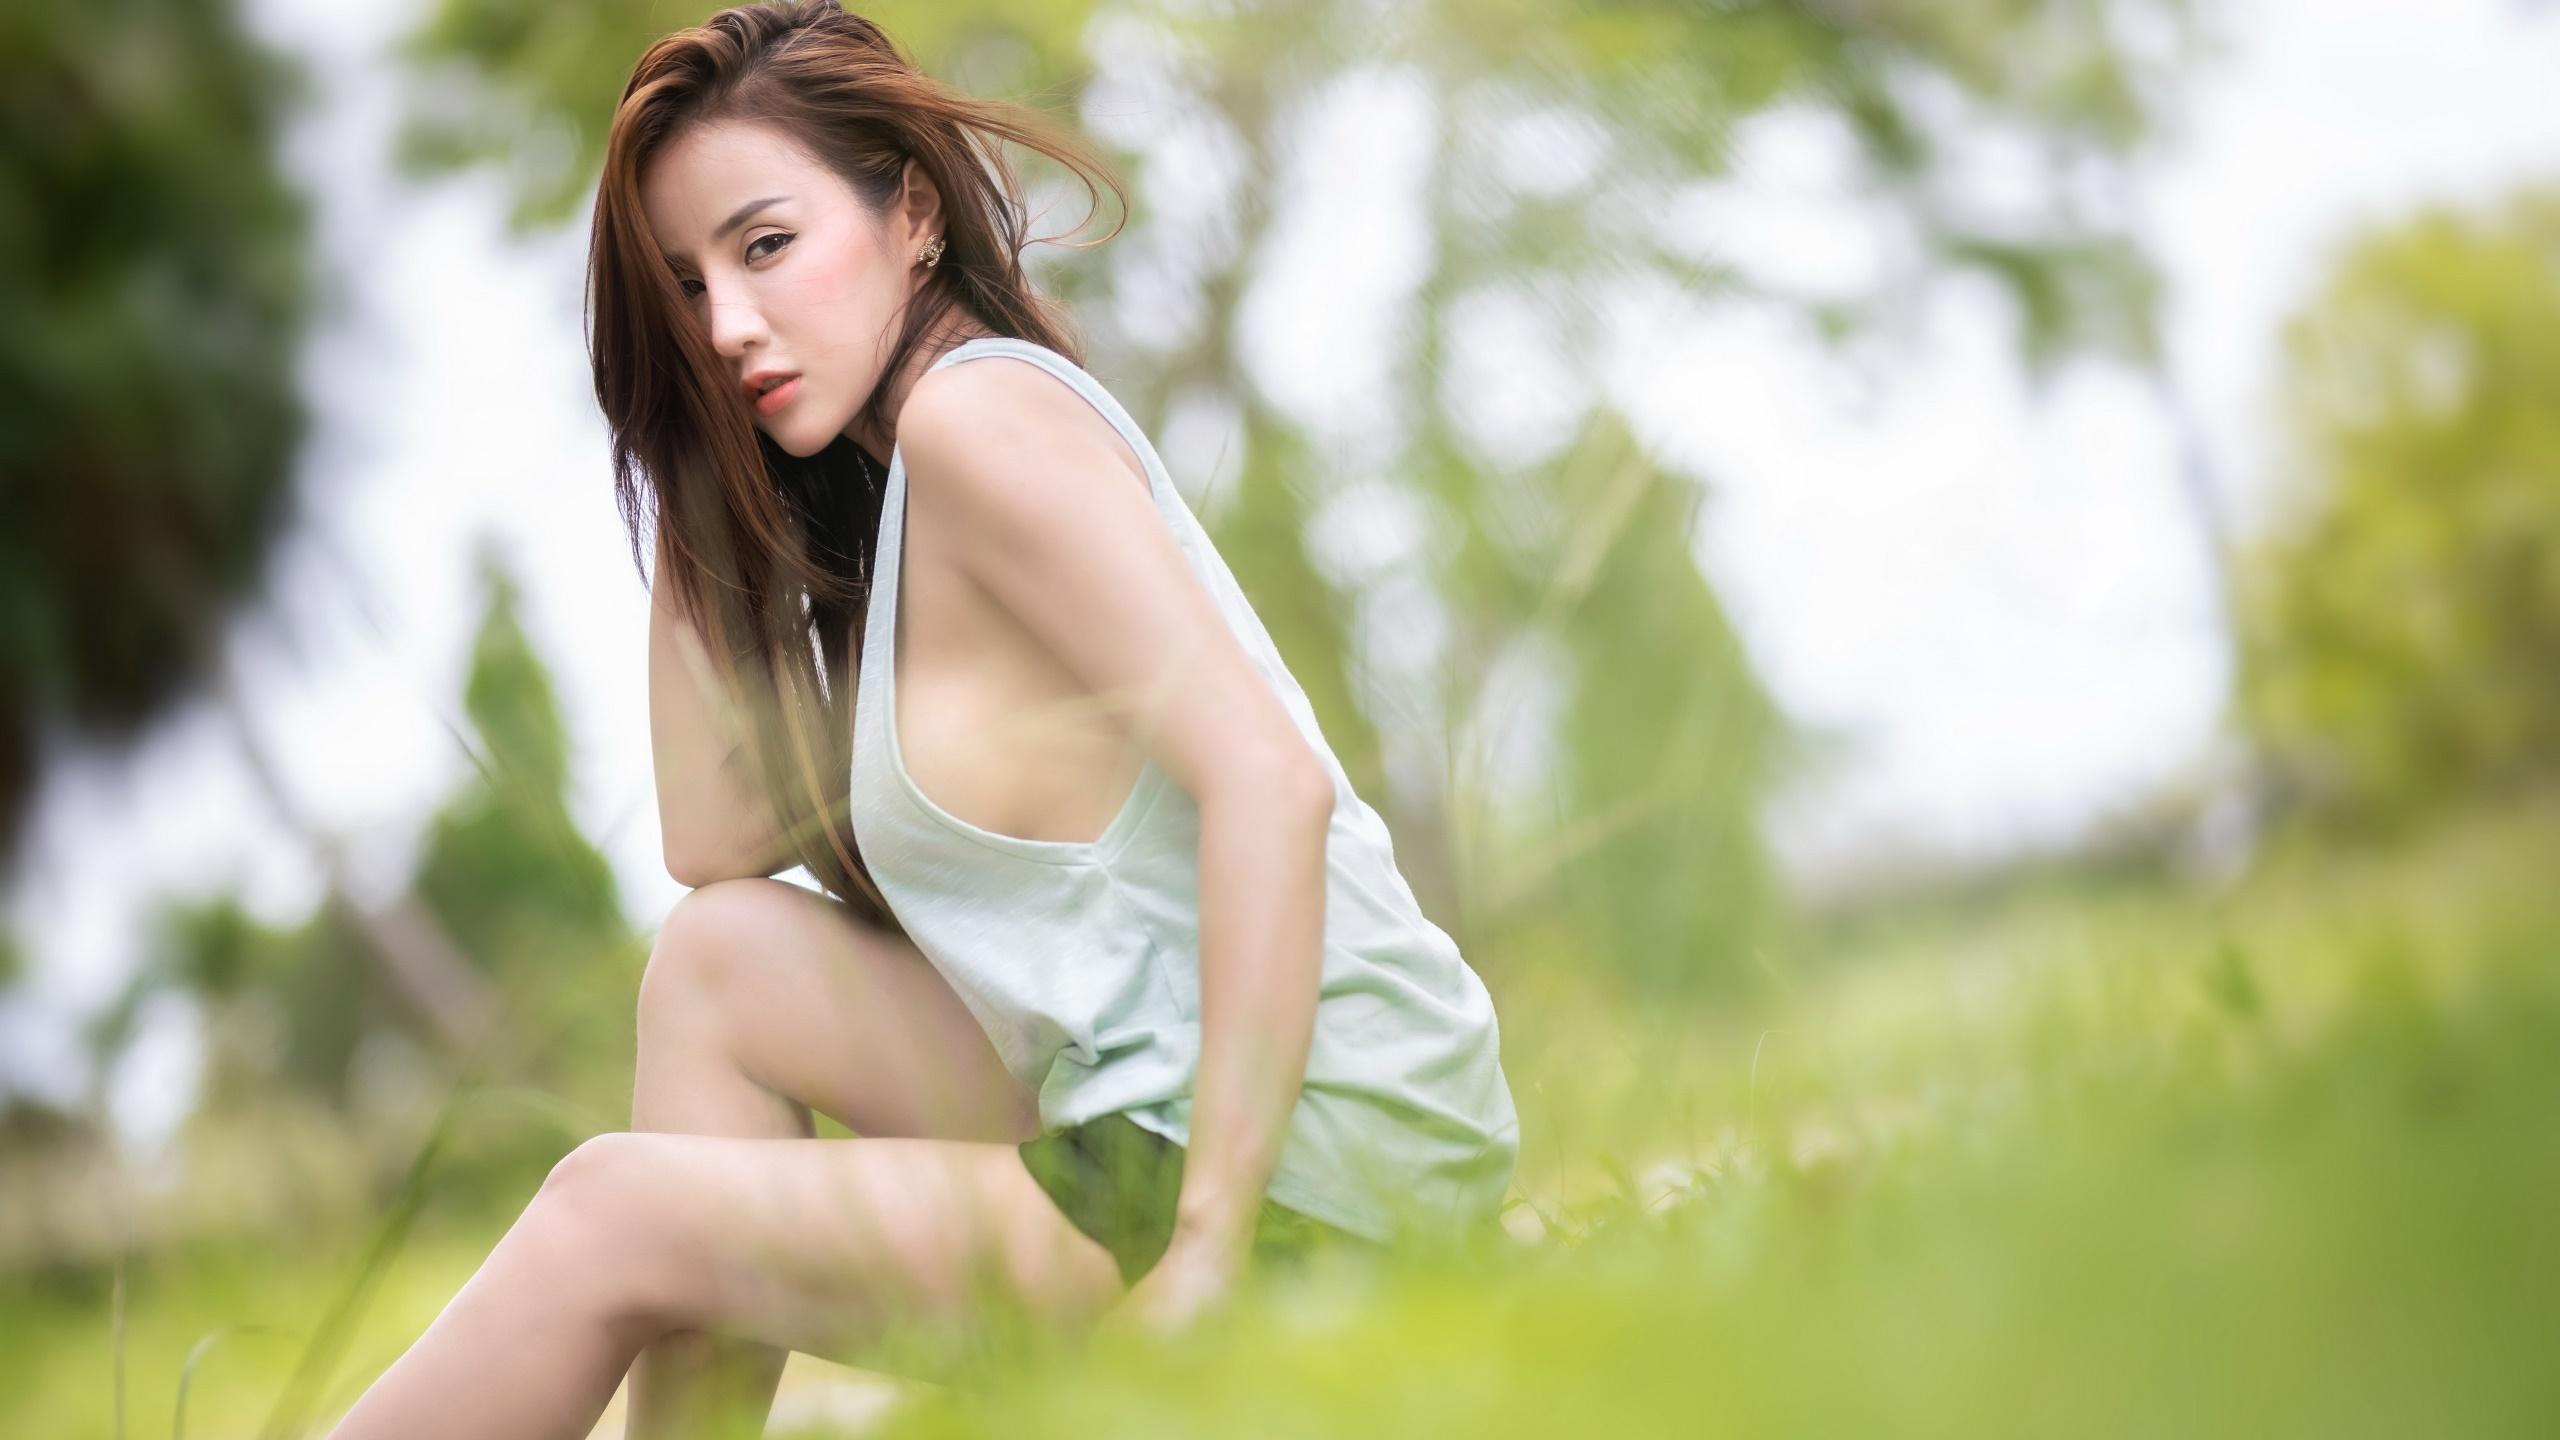 Asian Outdoors Women Women Outdoors Model Looking At Viewer Sitting Grass Dyed Hair Long Hair Earrin 2560x1440